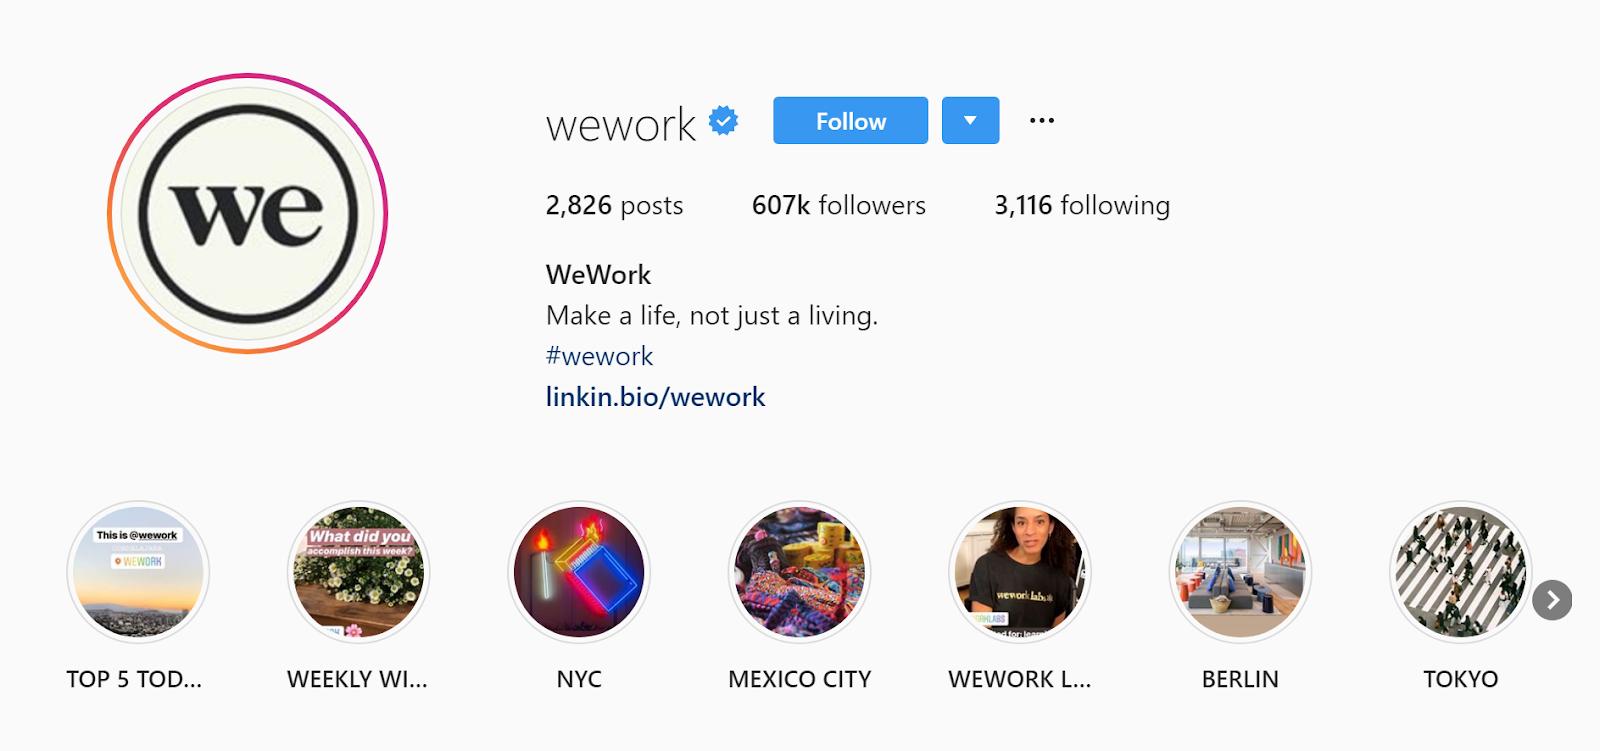 WeWork's Instagram business profile.